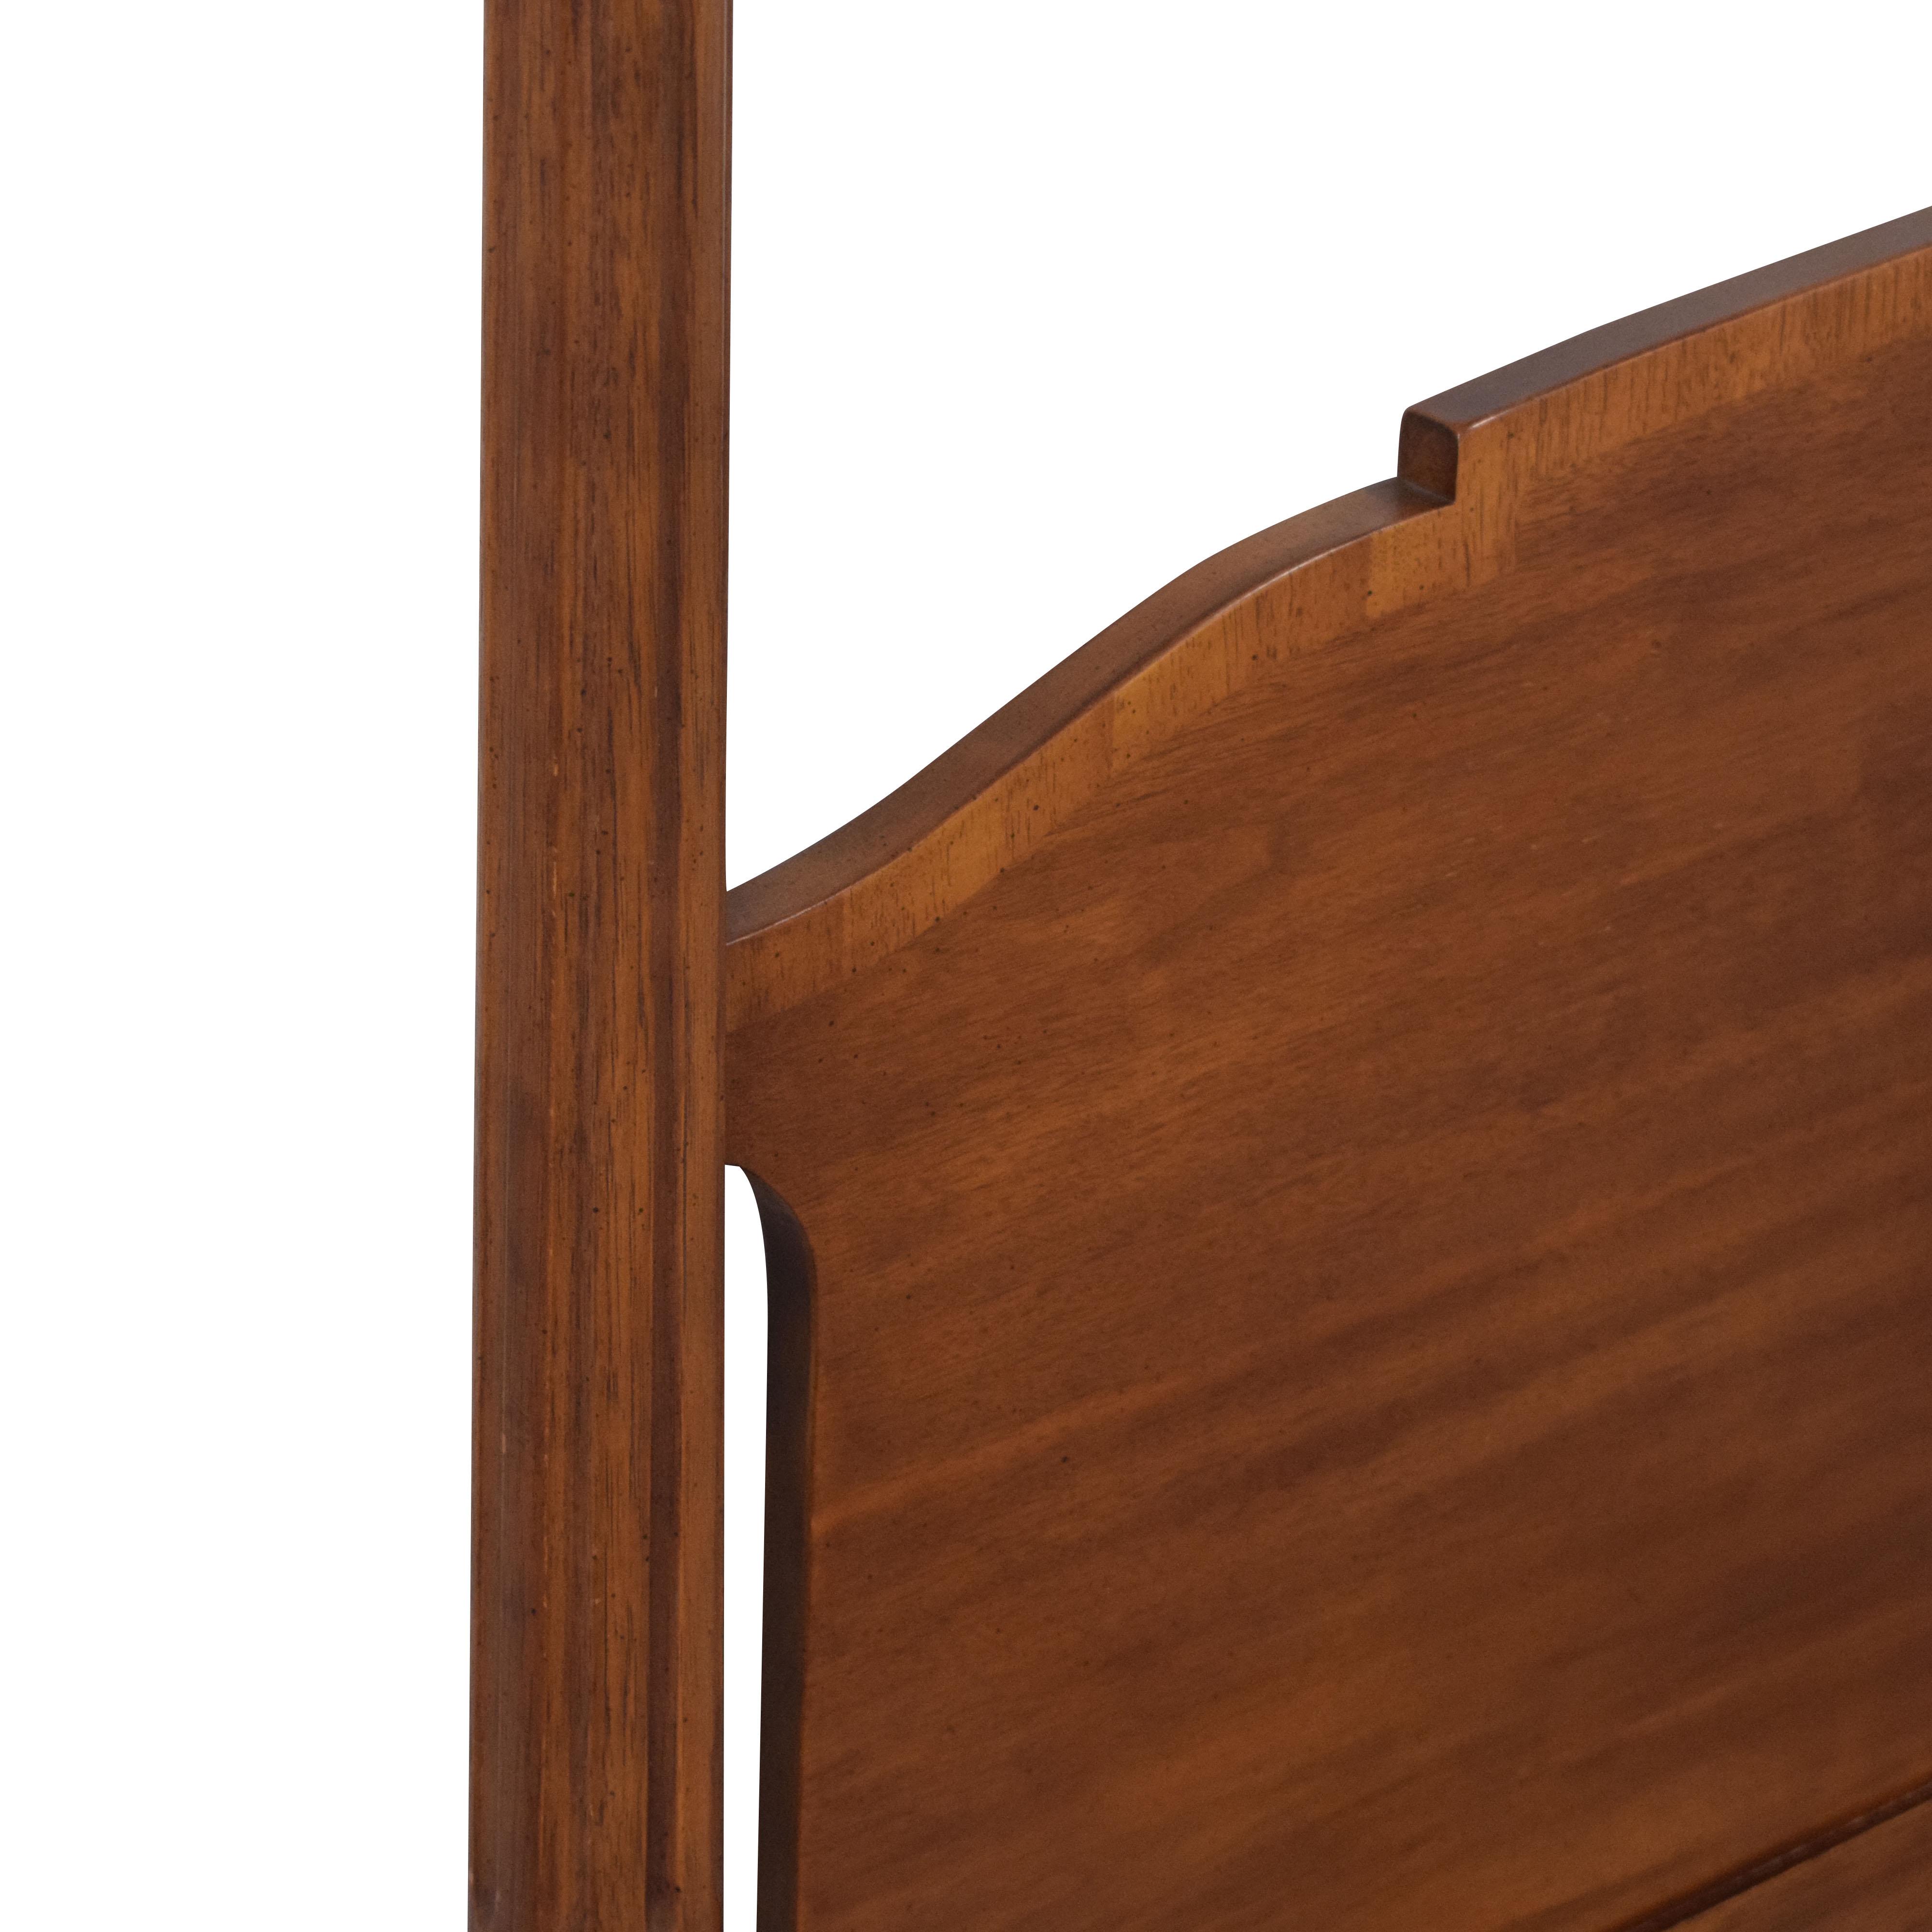 Fancher Furniture Fancher Furniture Queen bed Beds